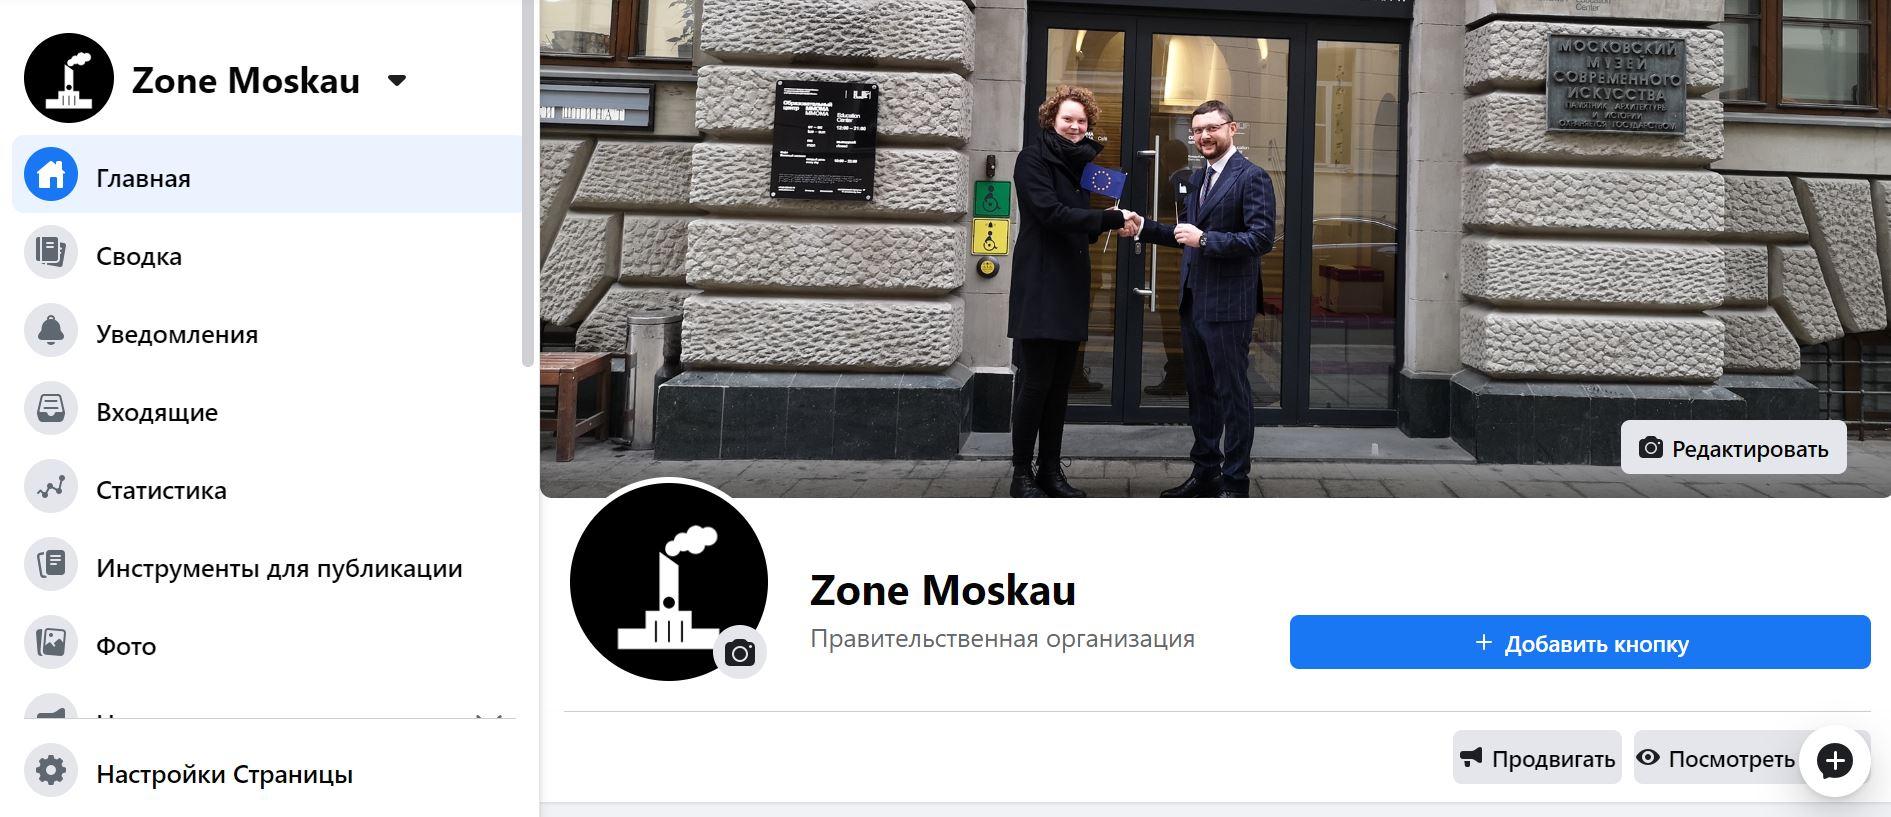 Вид редакторского интерфейса страницы Zone Moskau. Проект Institutfür Alles Mögliche (Берлин) для фестиваля самоорганиза